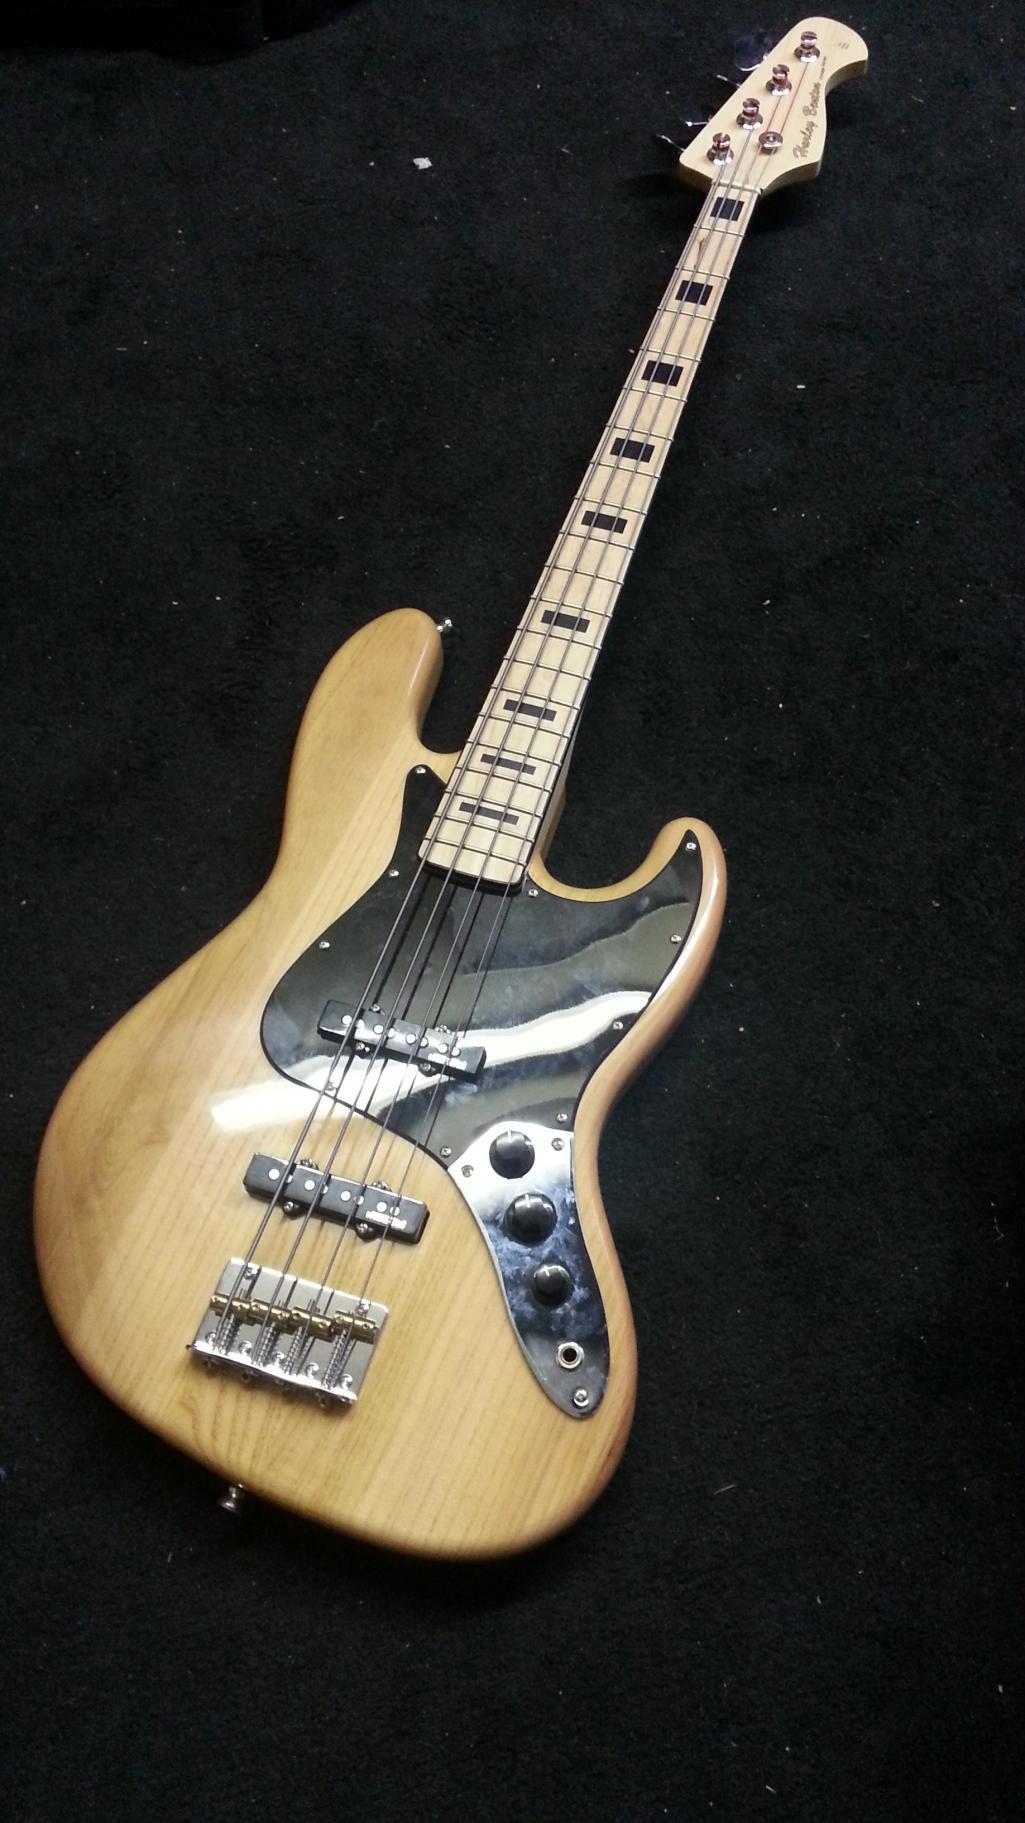 248210d1353962057-bass-harley-benton-jb-75-na-vintage-series-20121124_214114.jpg